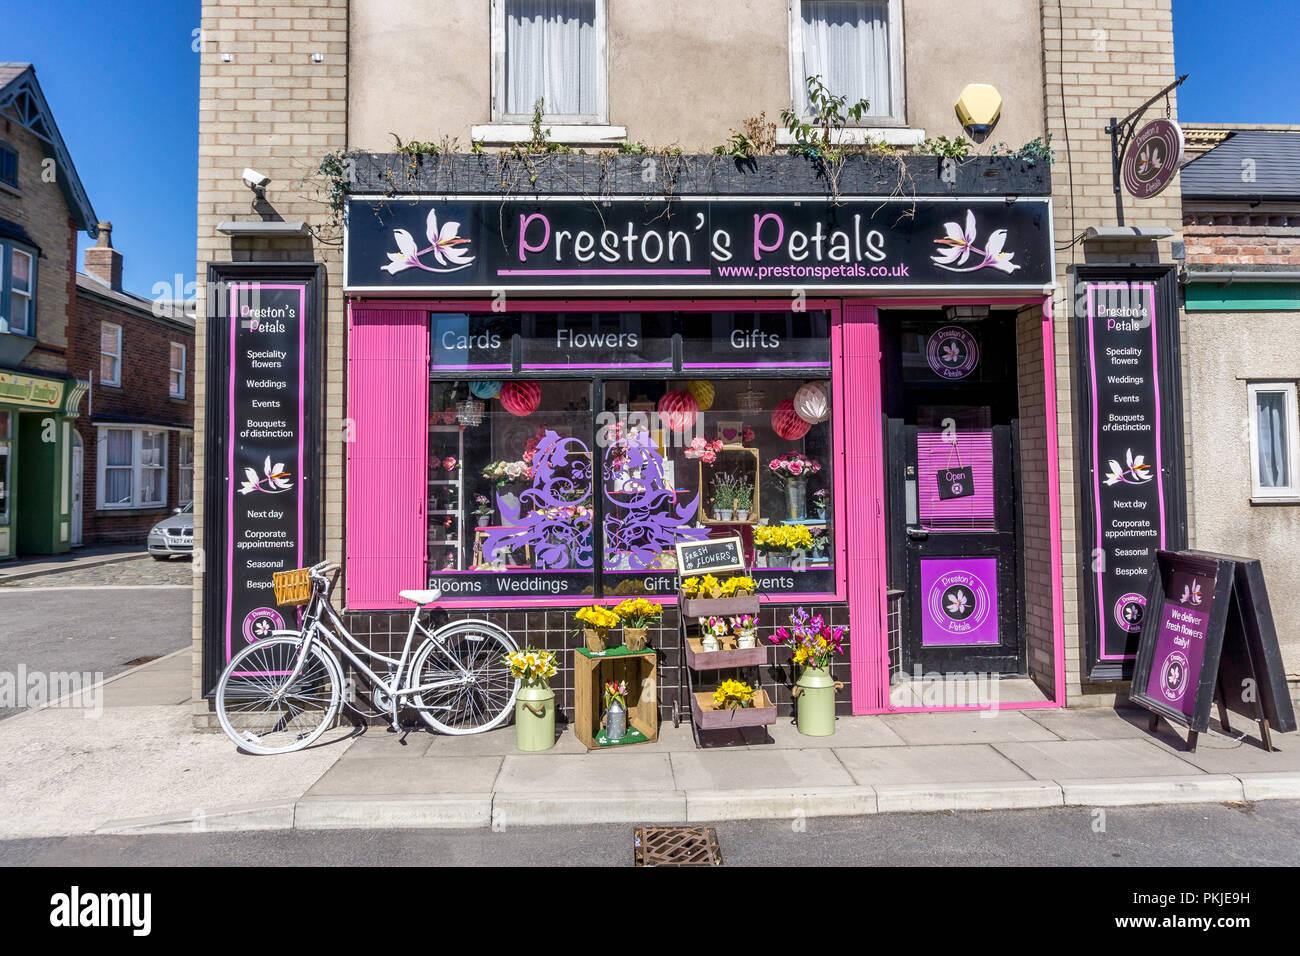 prestons petals, Rosamund Street, Coronation Street, The Studios from dock10, MediaCity UK, Salford M50 2EQ - Stock Image